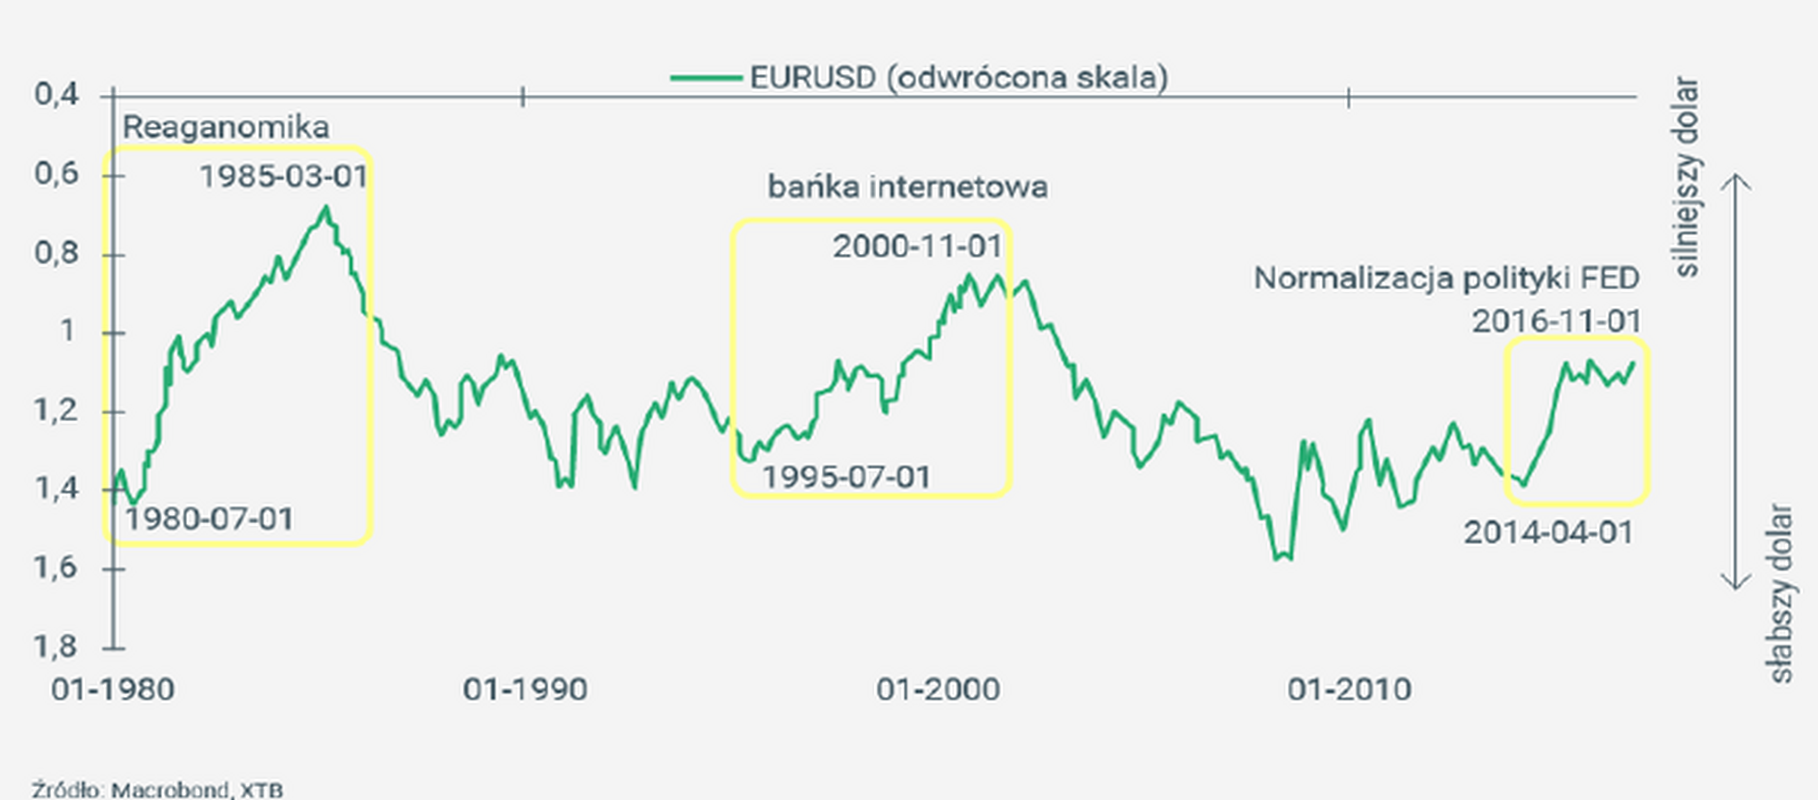 Notowania EUR/USD od 1980 r.